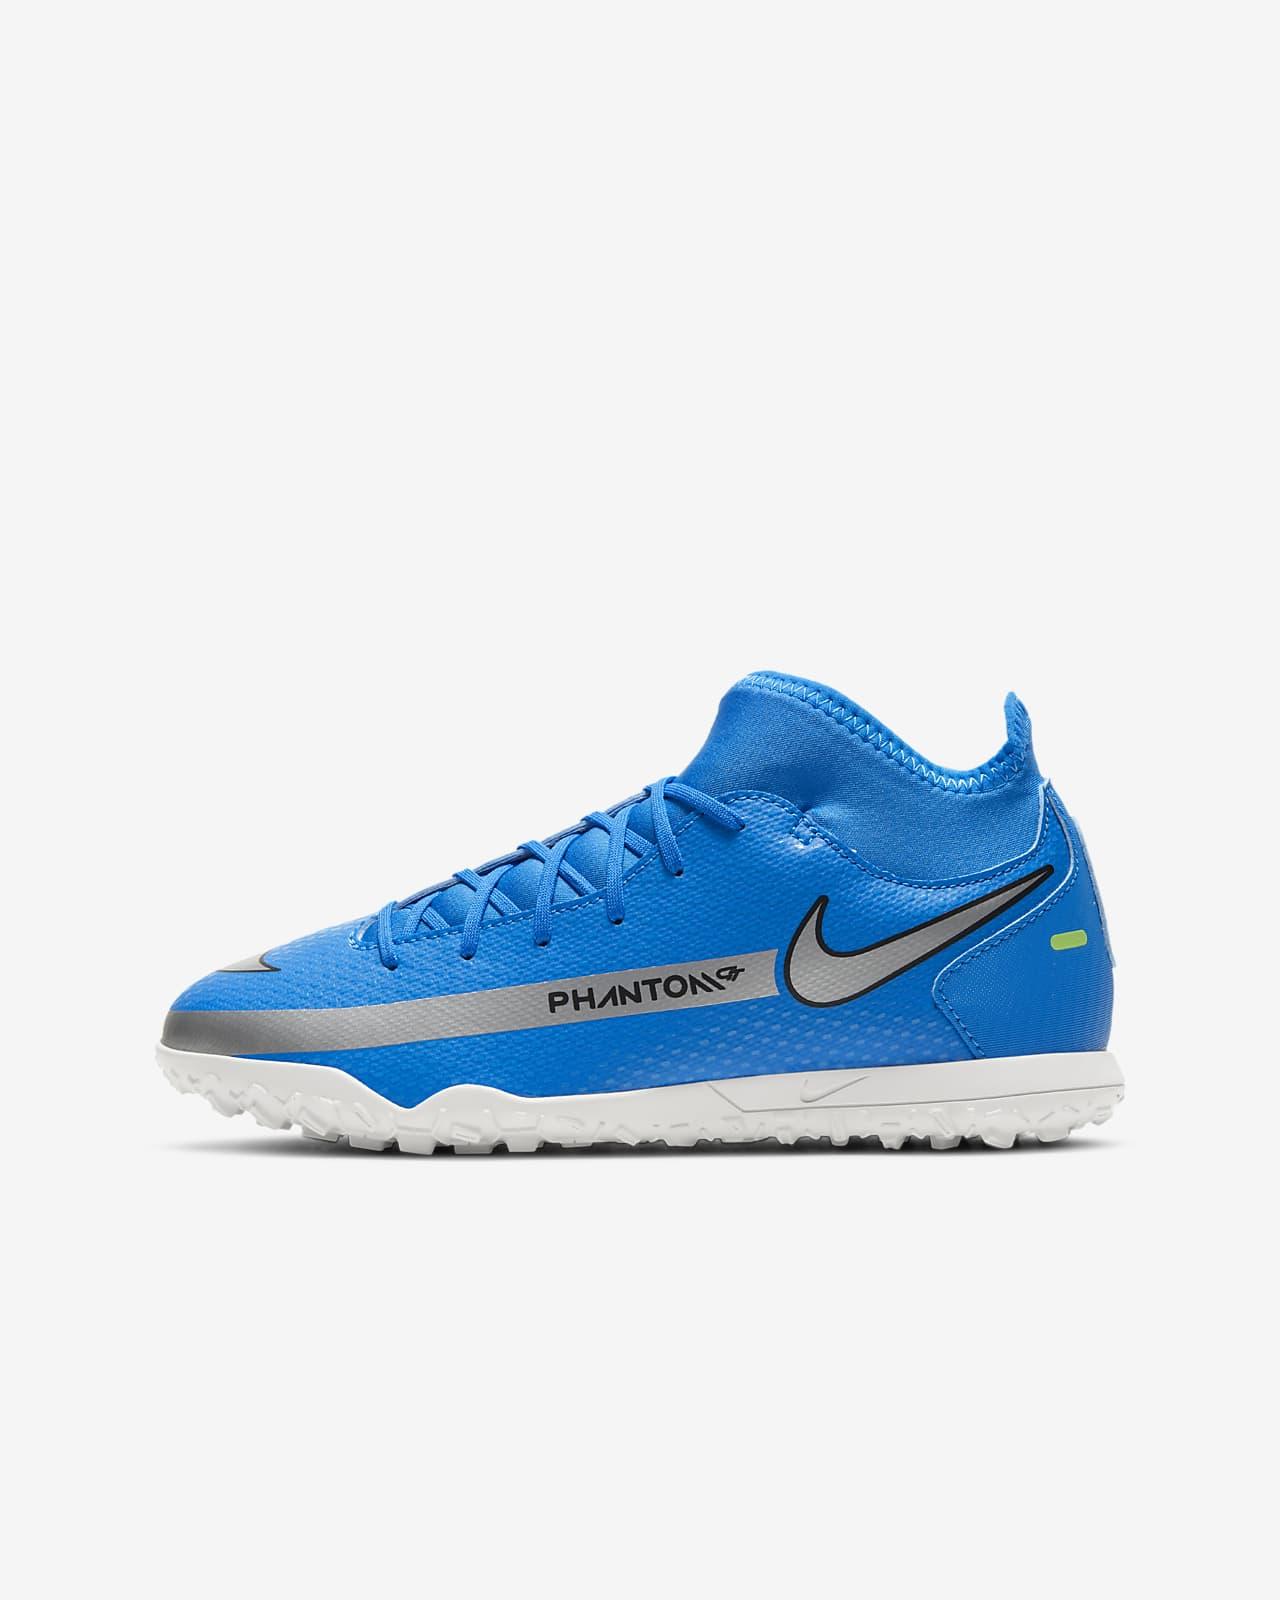 Nike Jr. Phantom GT Club Dynamic Fit TF Little/Big Kids' Artificial-Turf Soccer Shoes